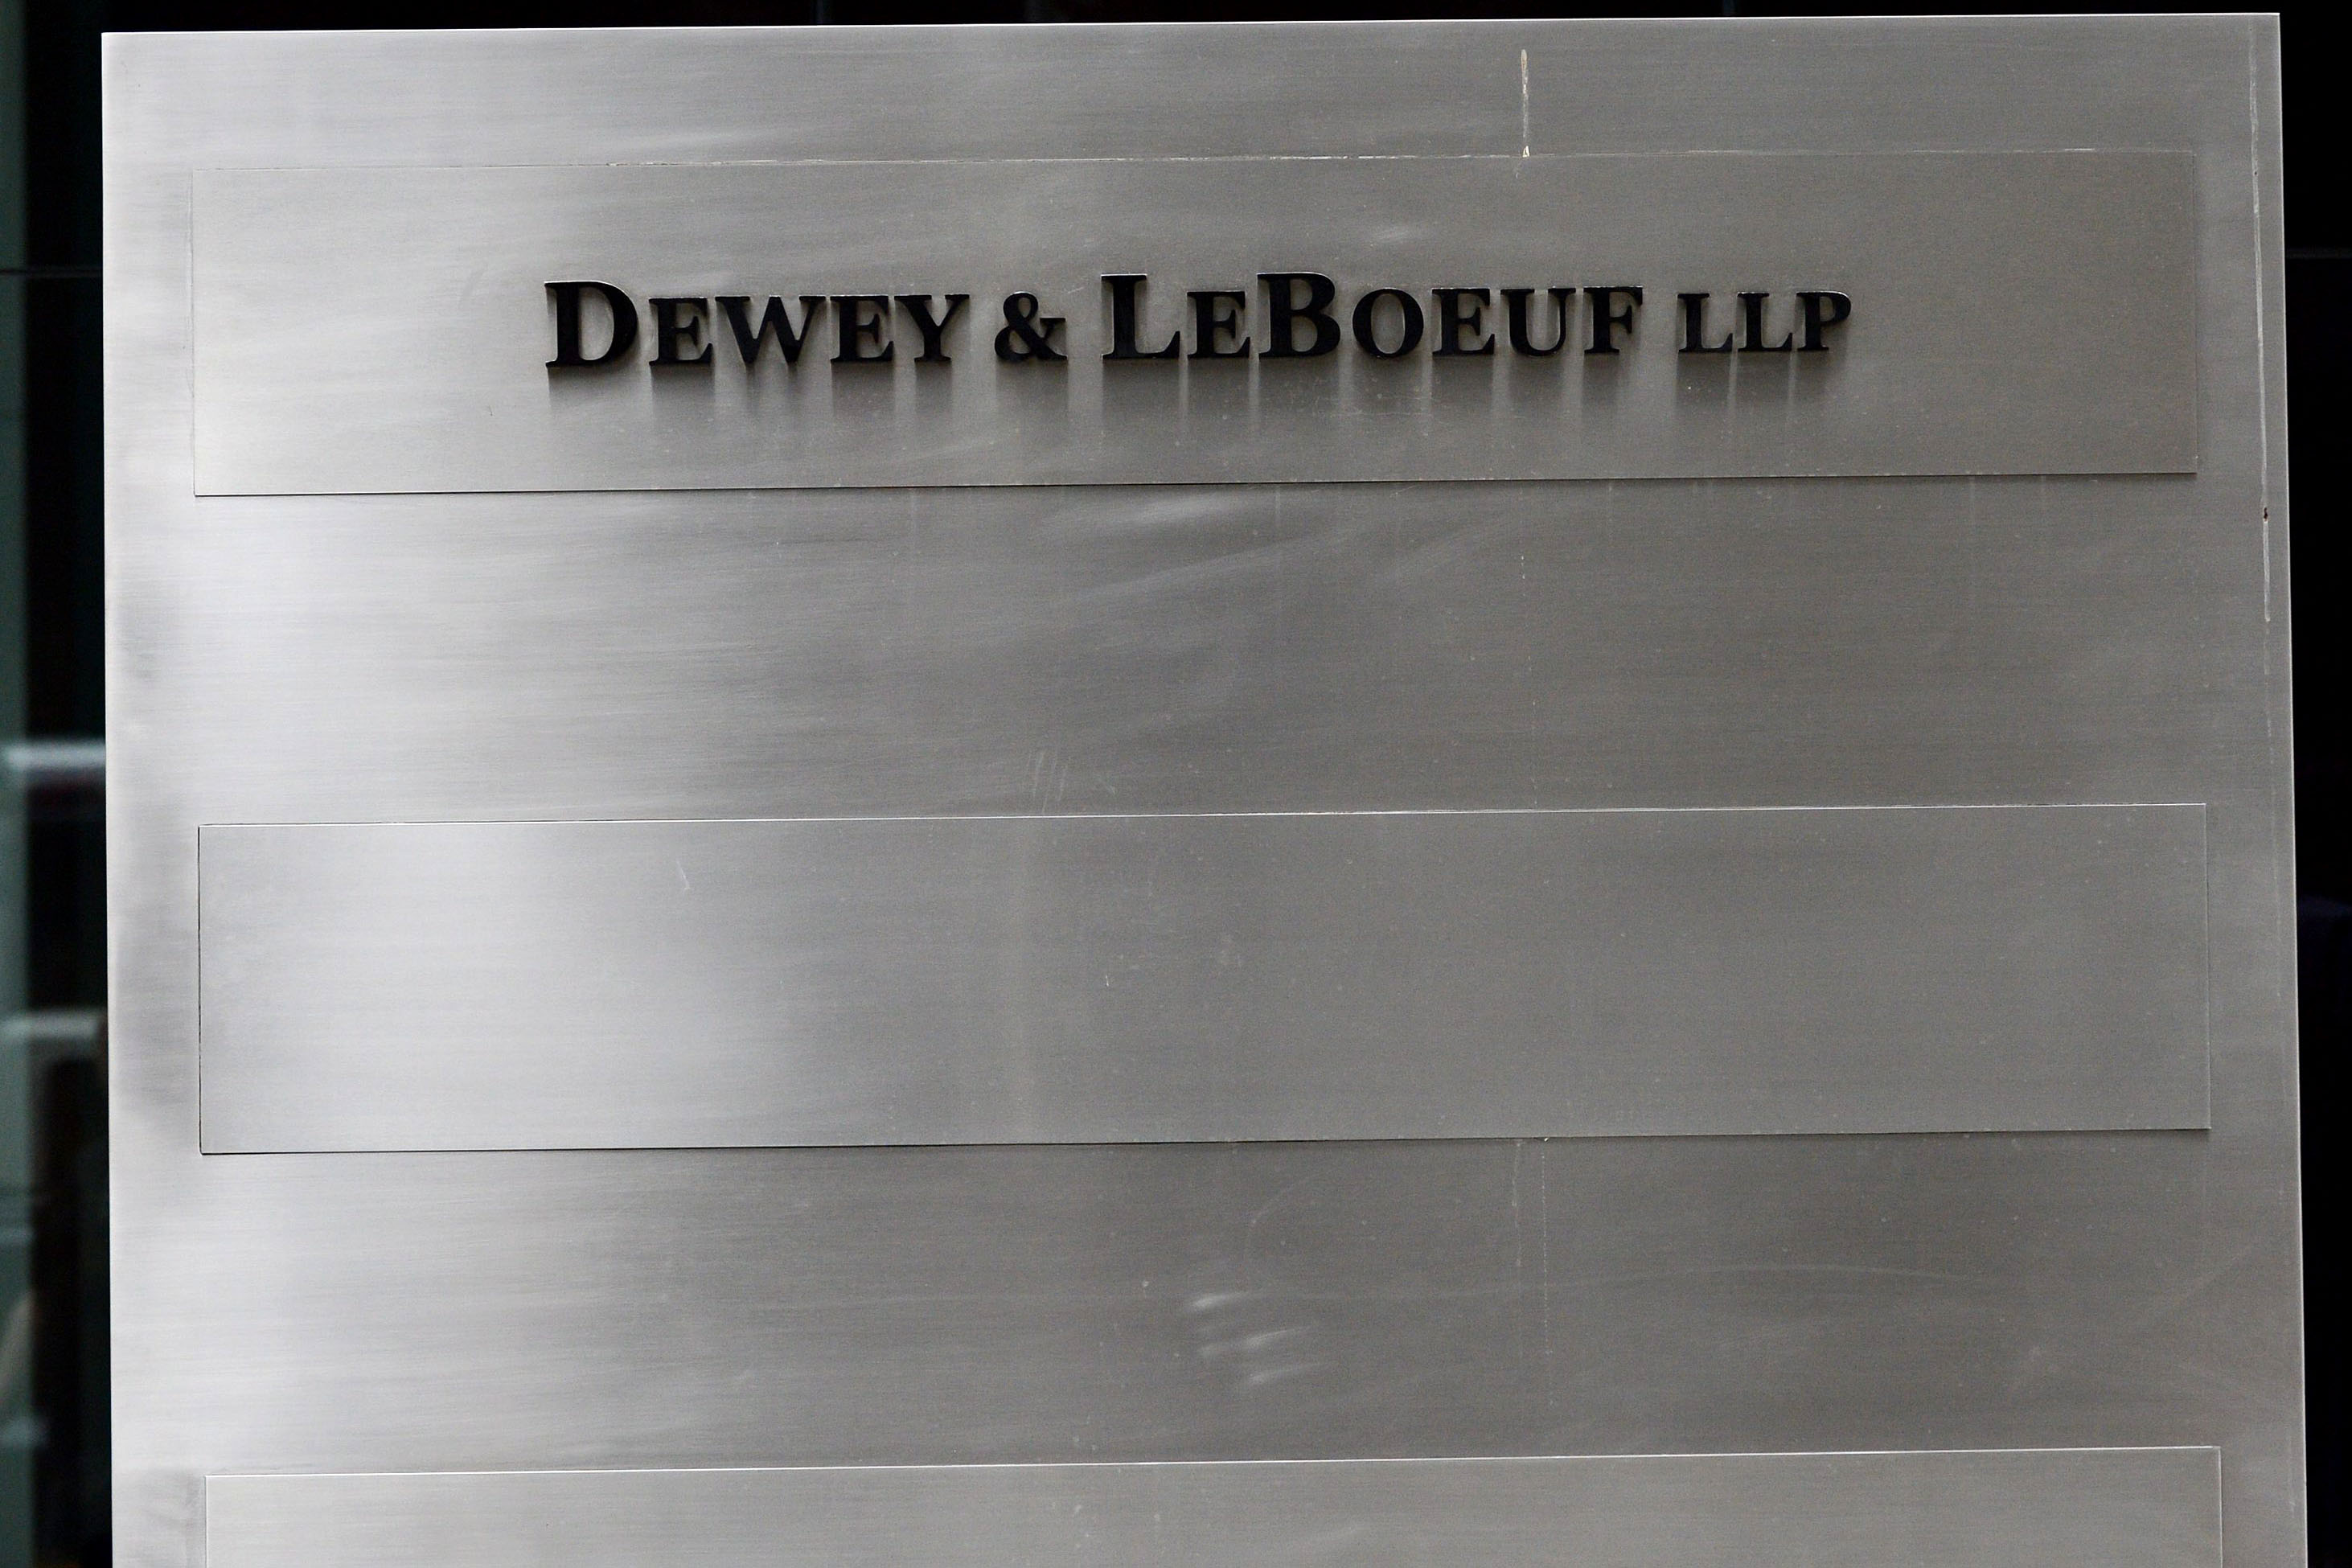 Dewey and LeBoeufbankruptcy